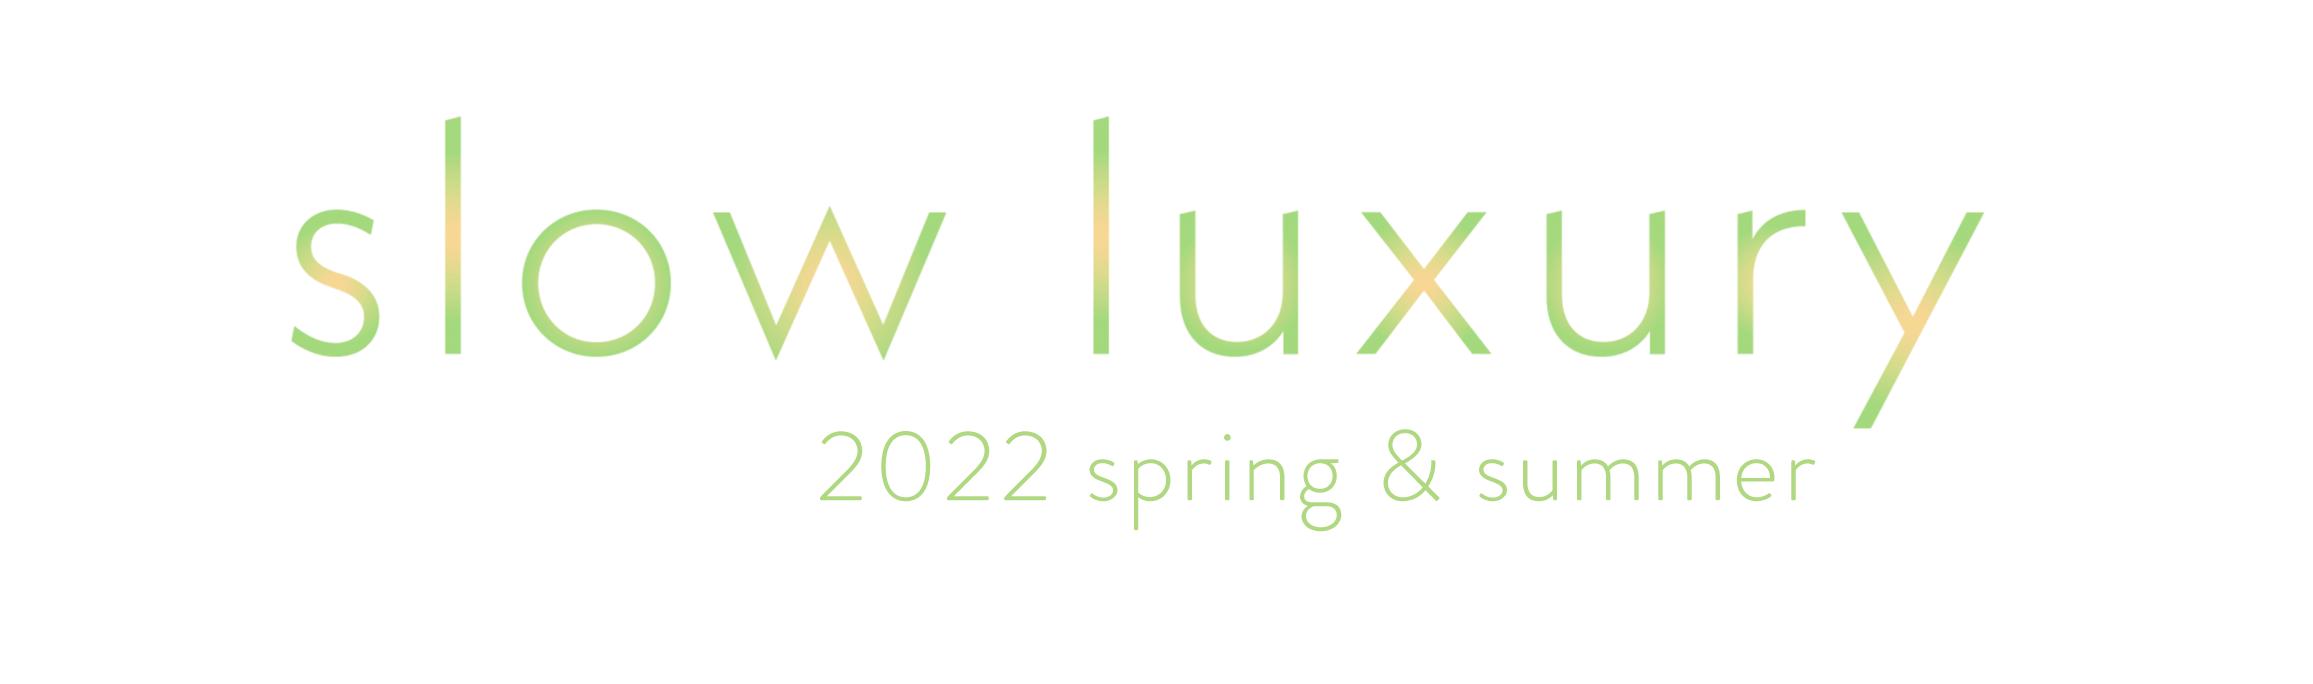 2022ss slow luxury 2022春夏 ファッショントレンド